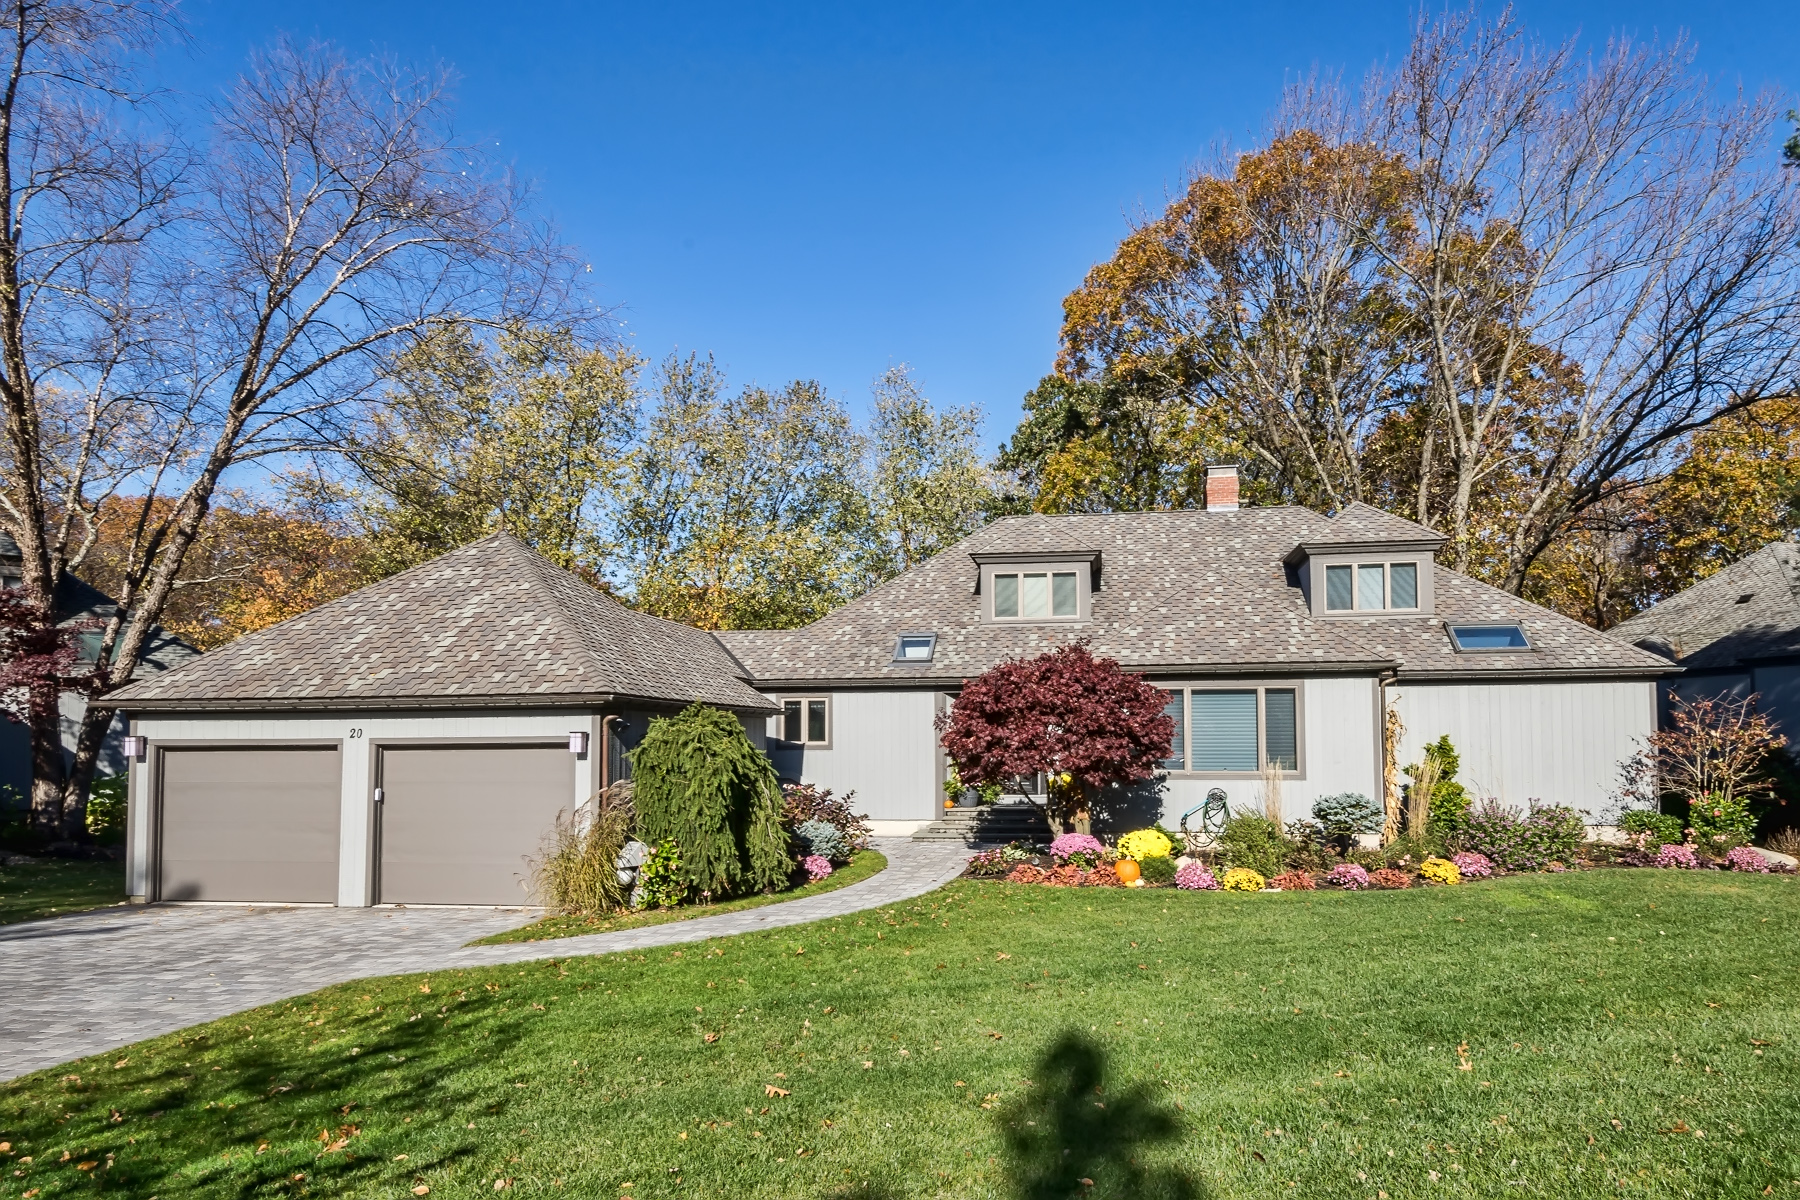 Single Family Homes για την Πώληση στο An exceptional life starts here! One Salem Street Unit 30, Swampscott, Μασαχουσετη 01907 Ηνωμένες Πολιτείες